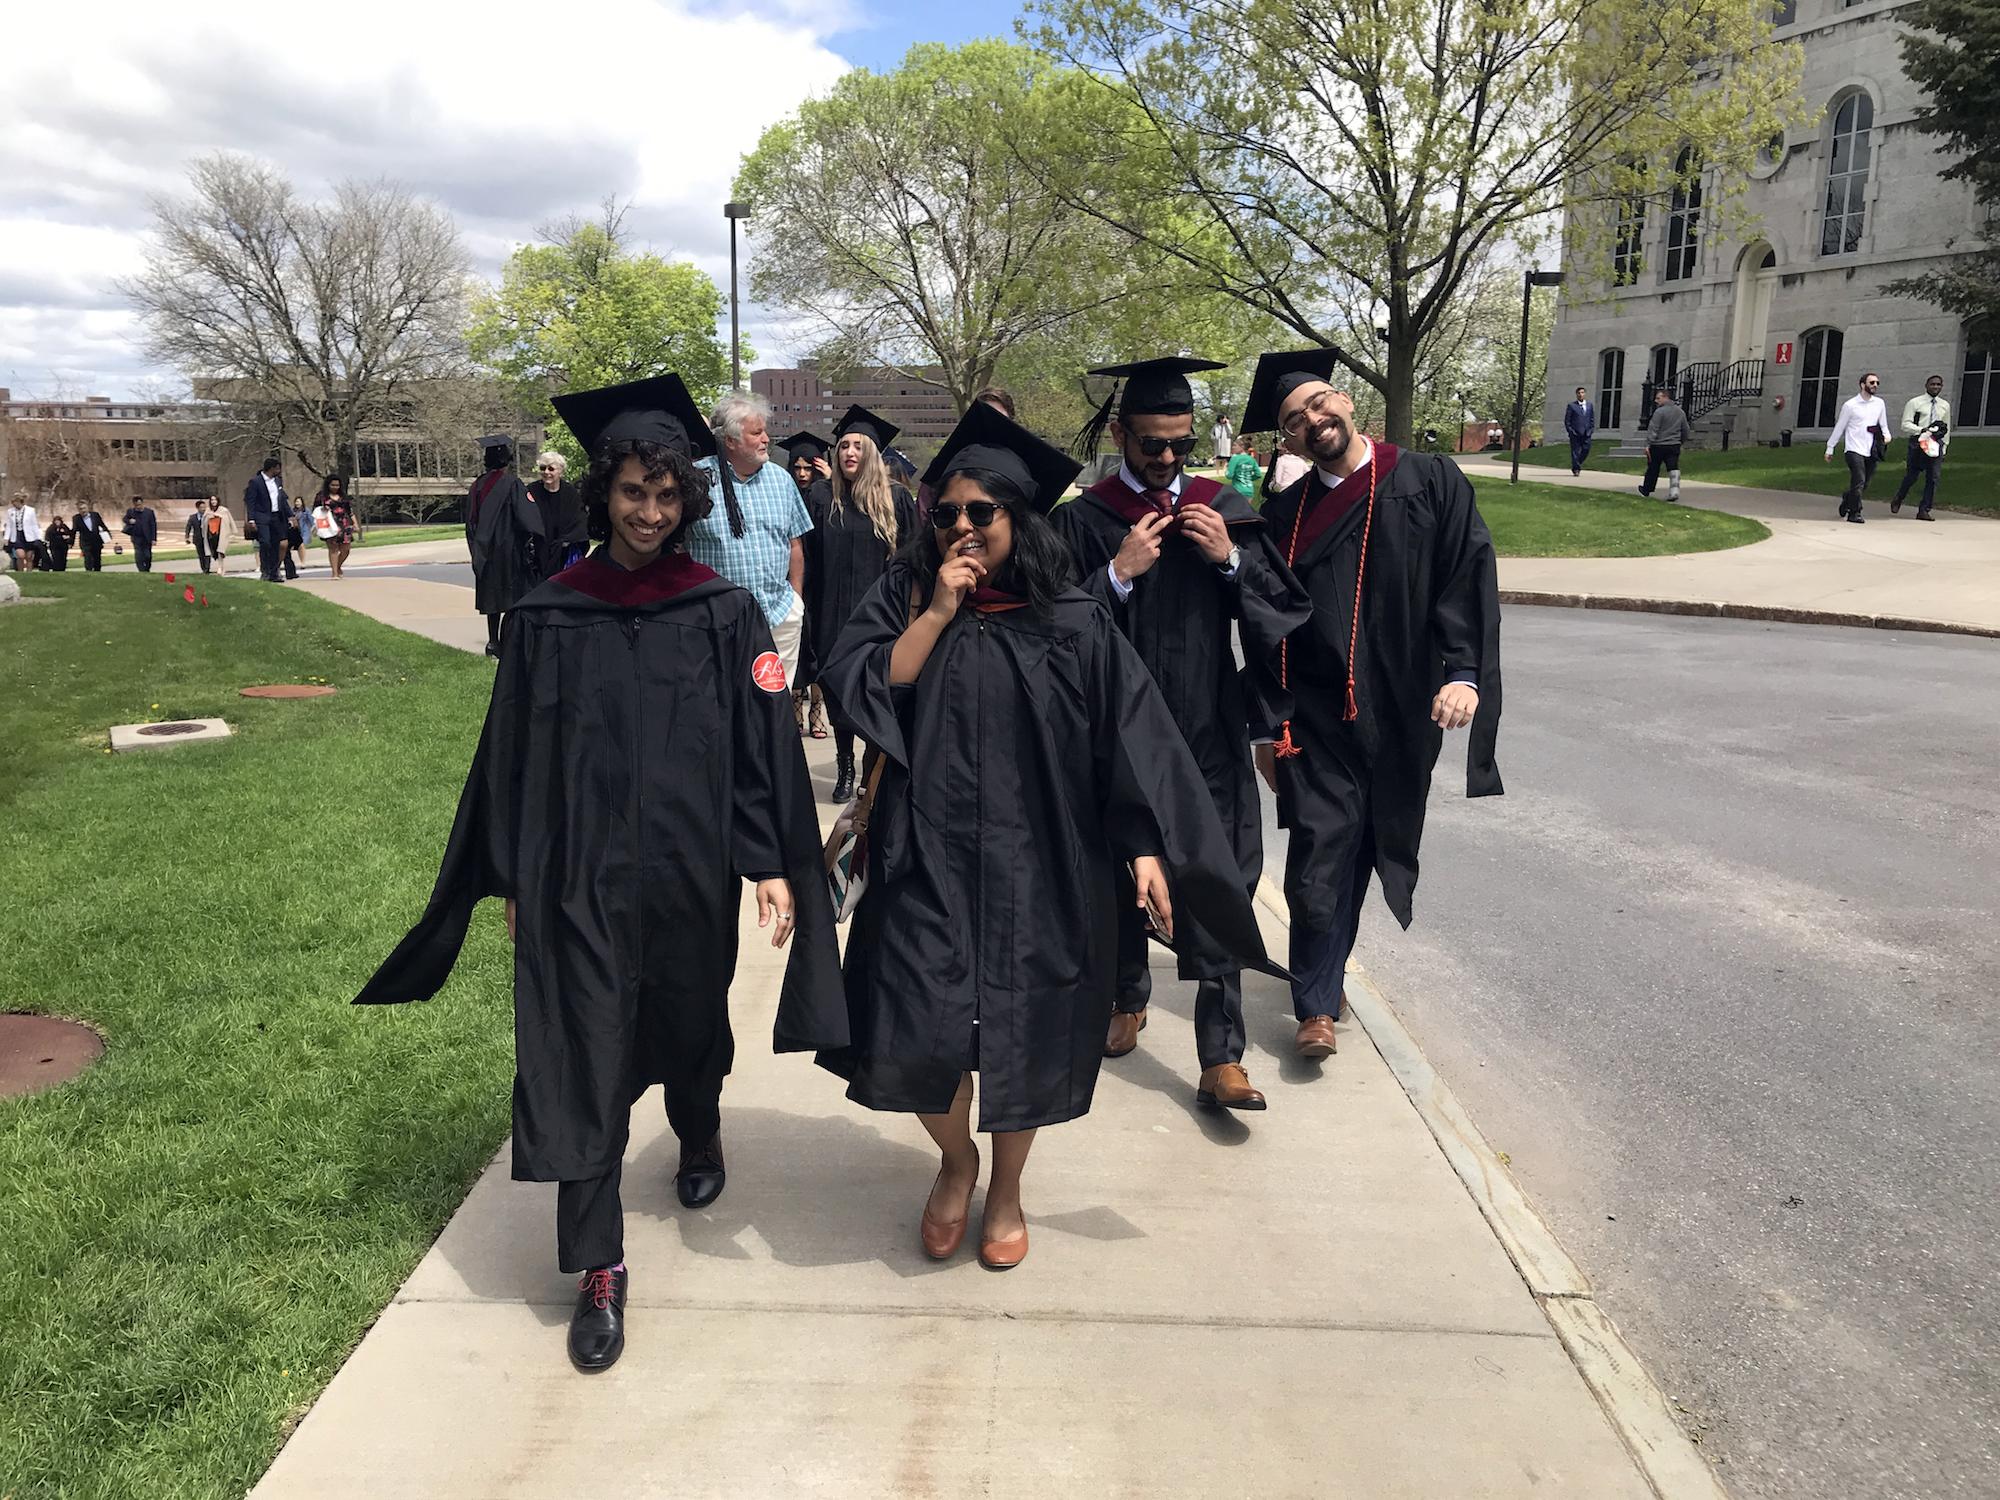 Syracuse University Newhouse Masters students Lyle Michael, Sajida Ayyup, Mo Nomani and Tyler Lowell on graduation day, May 2019.